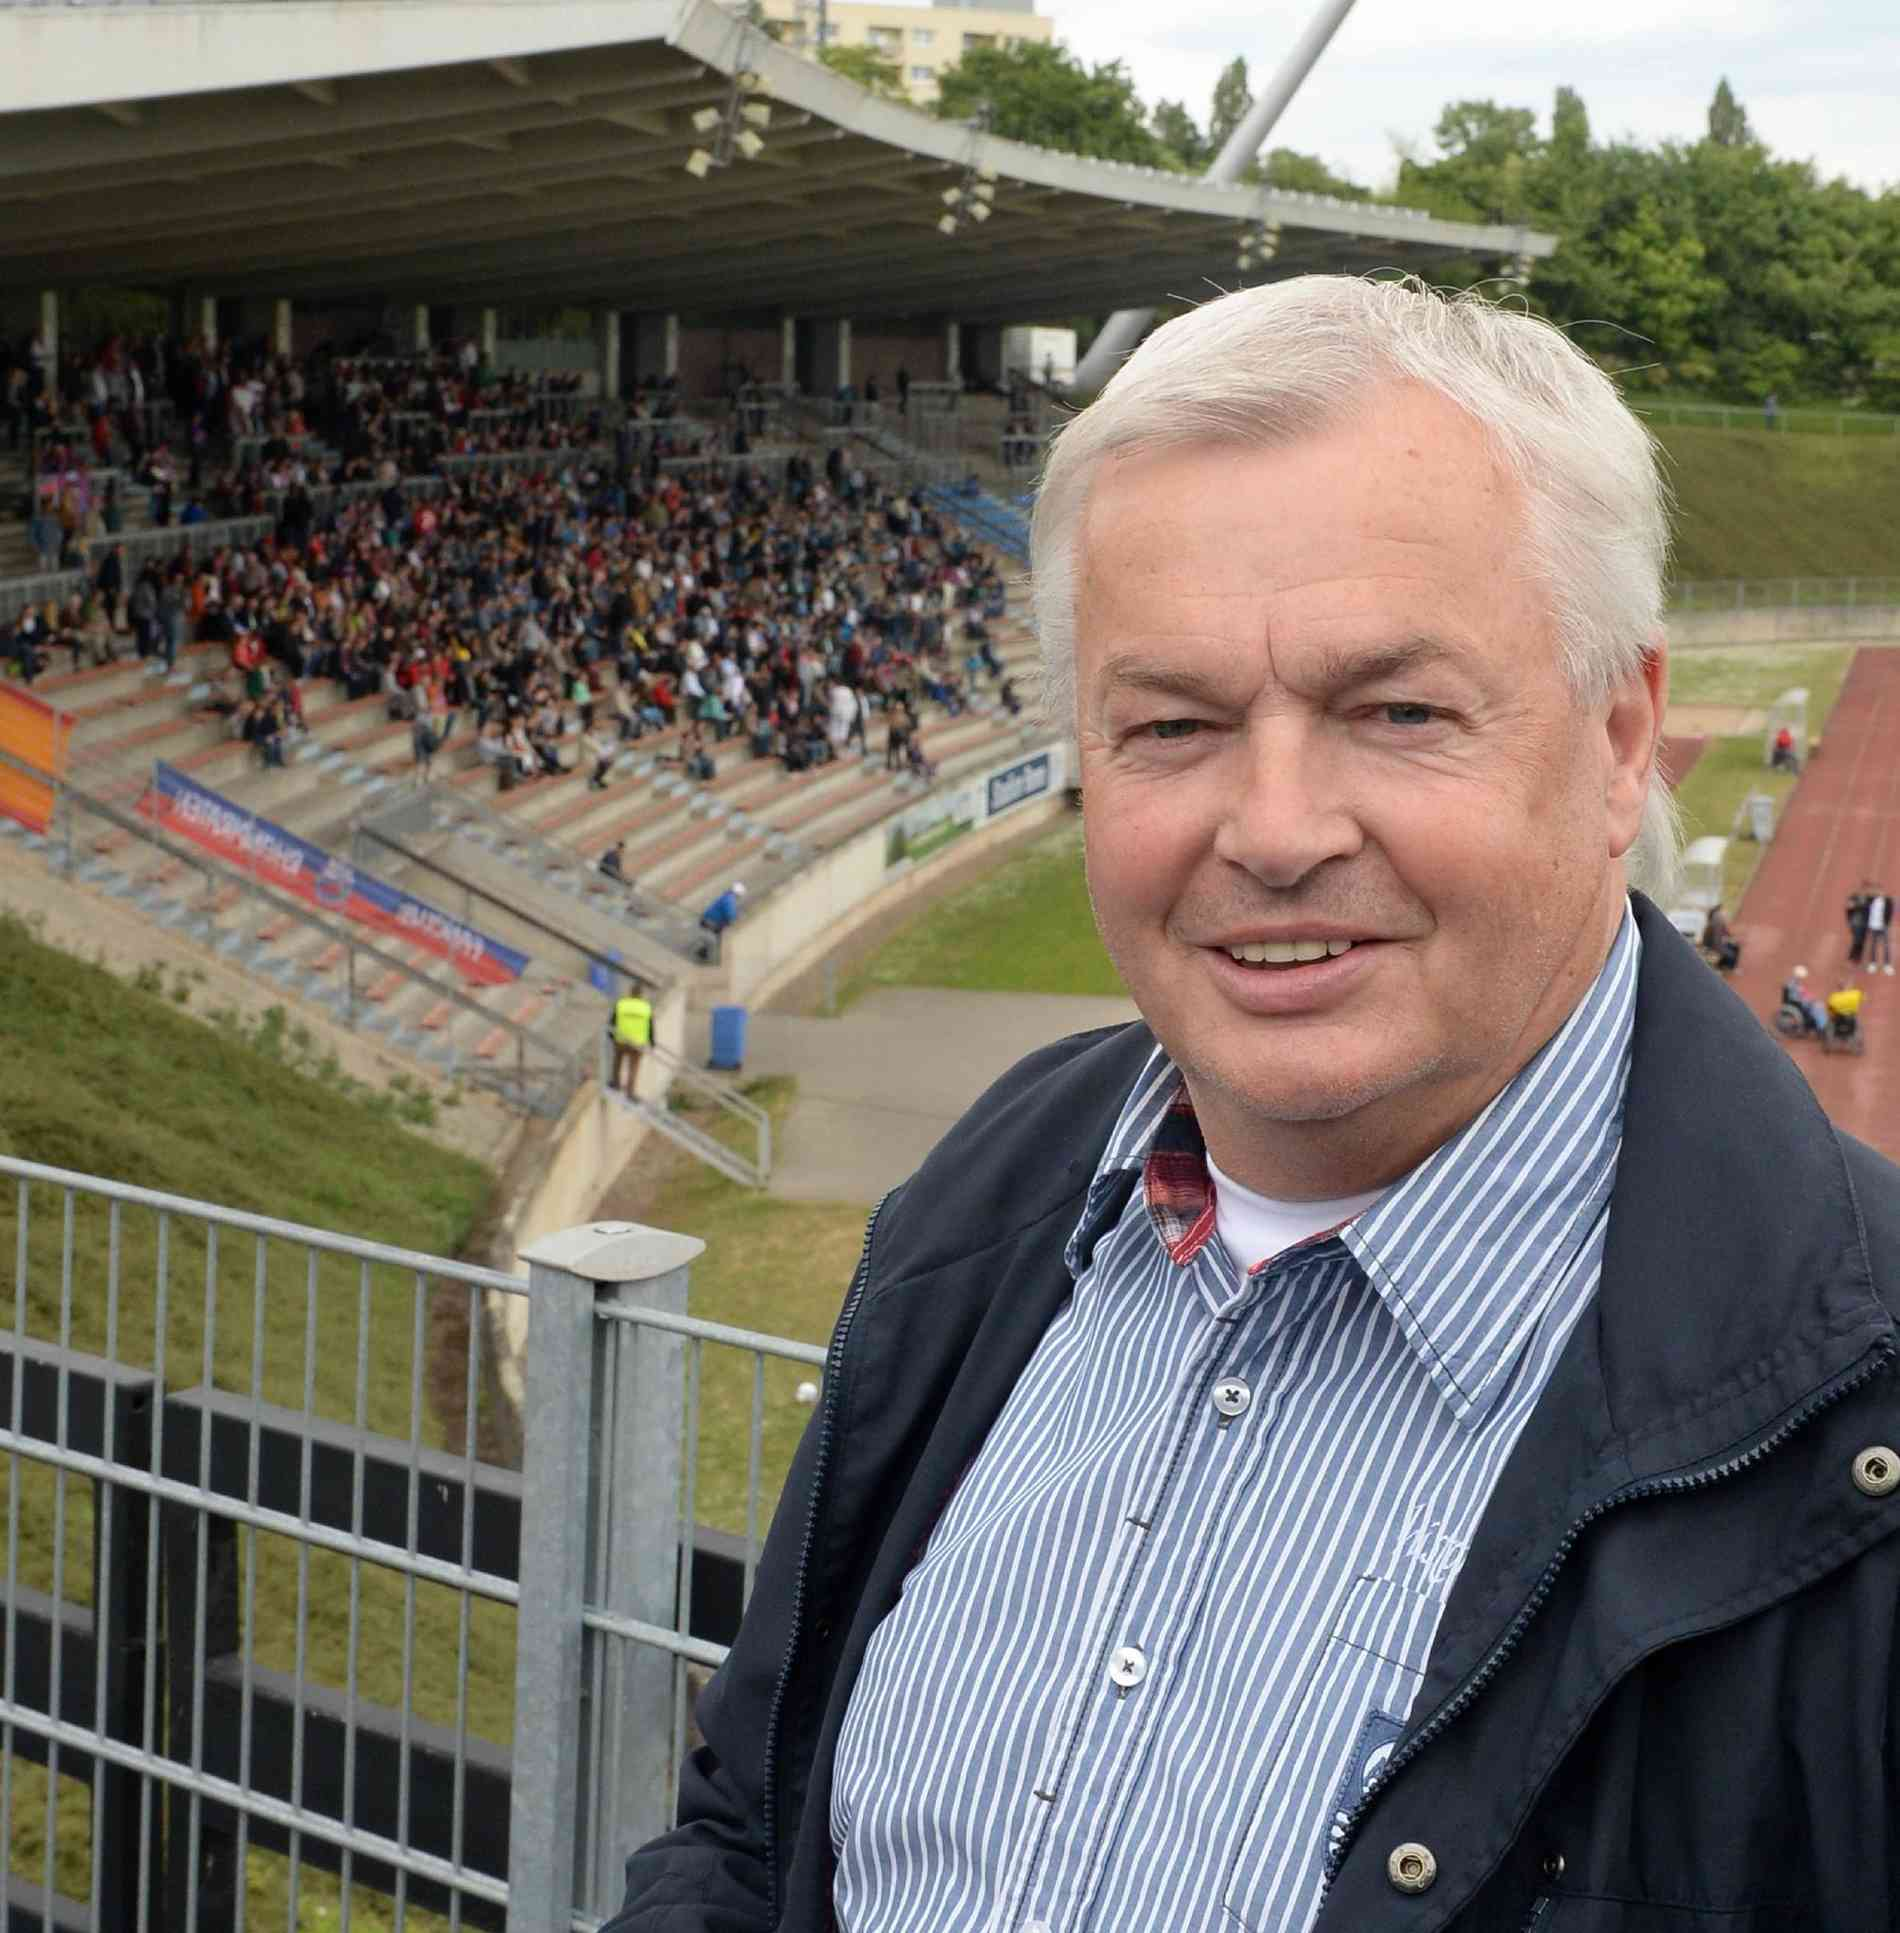 Hannes Bongartz